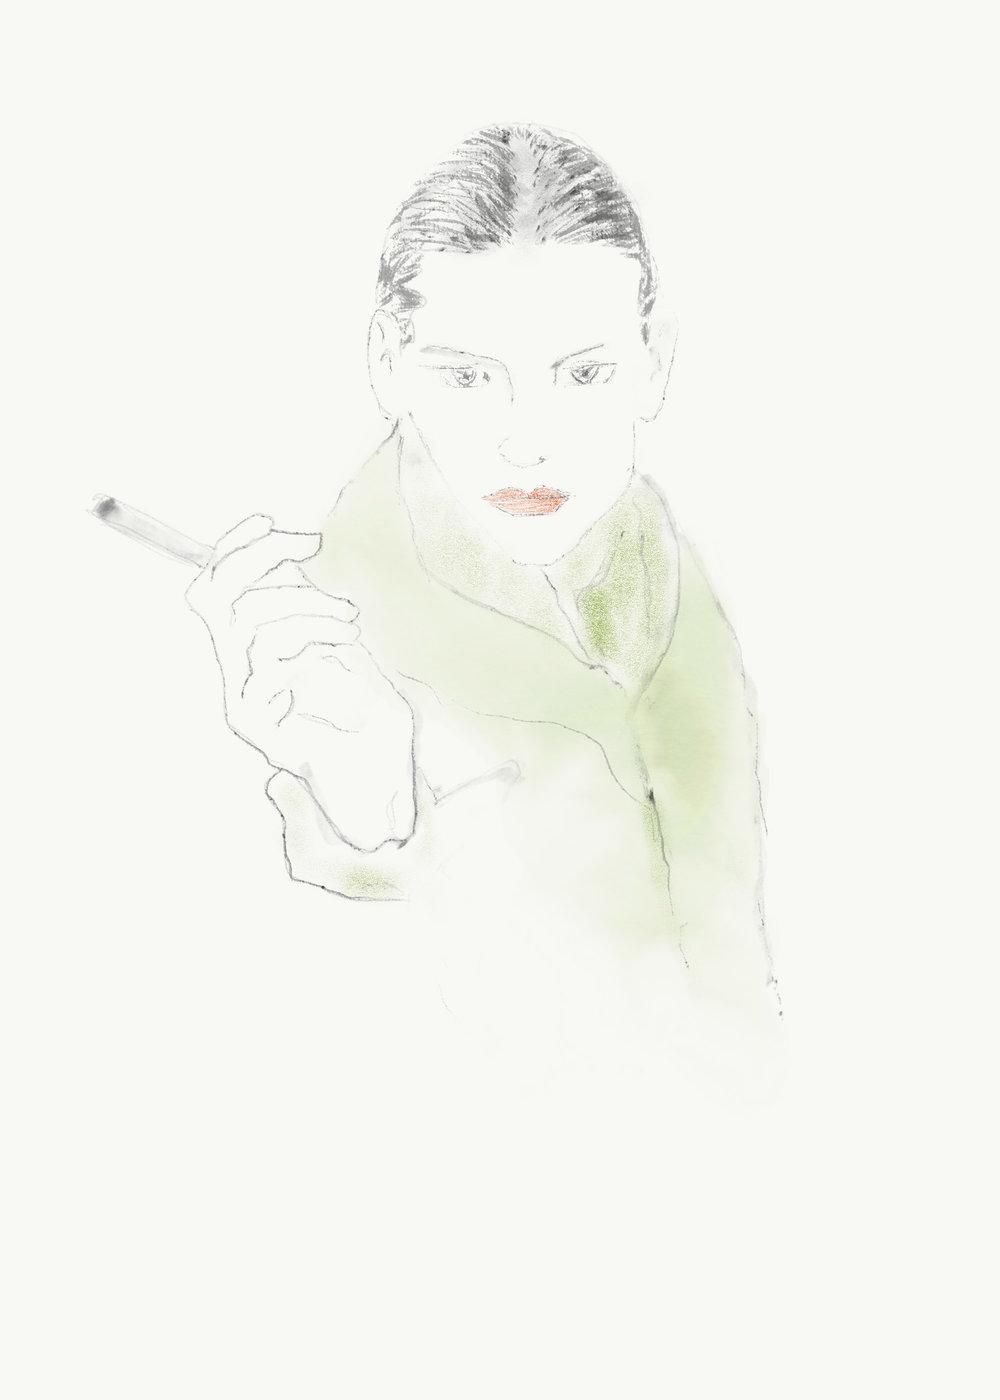 2_Chhandak Pradhan-illustration-unfinished sketch-portrait.jpg